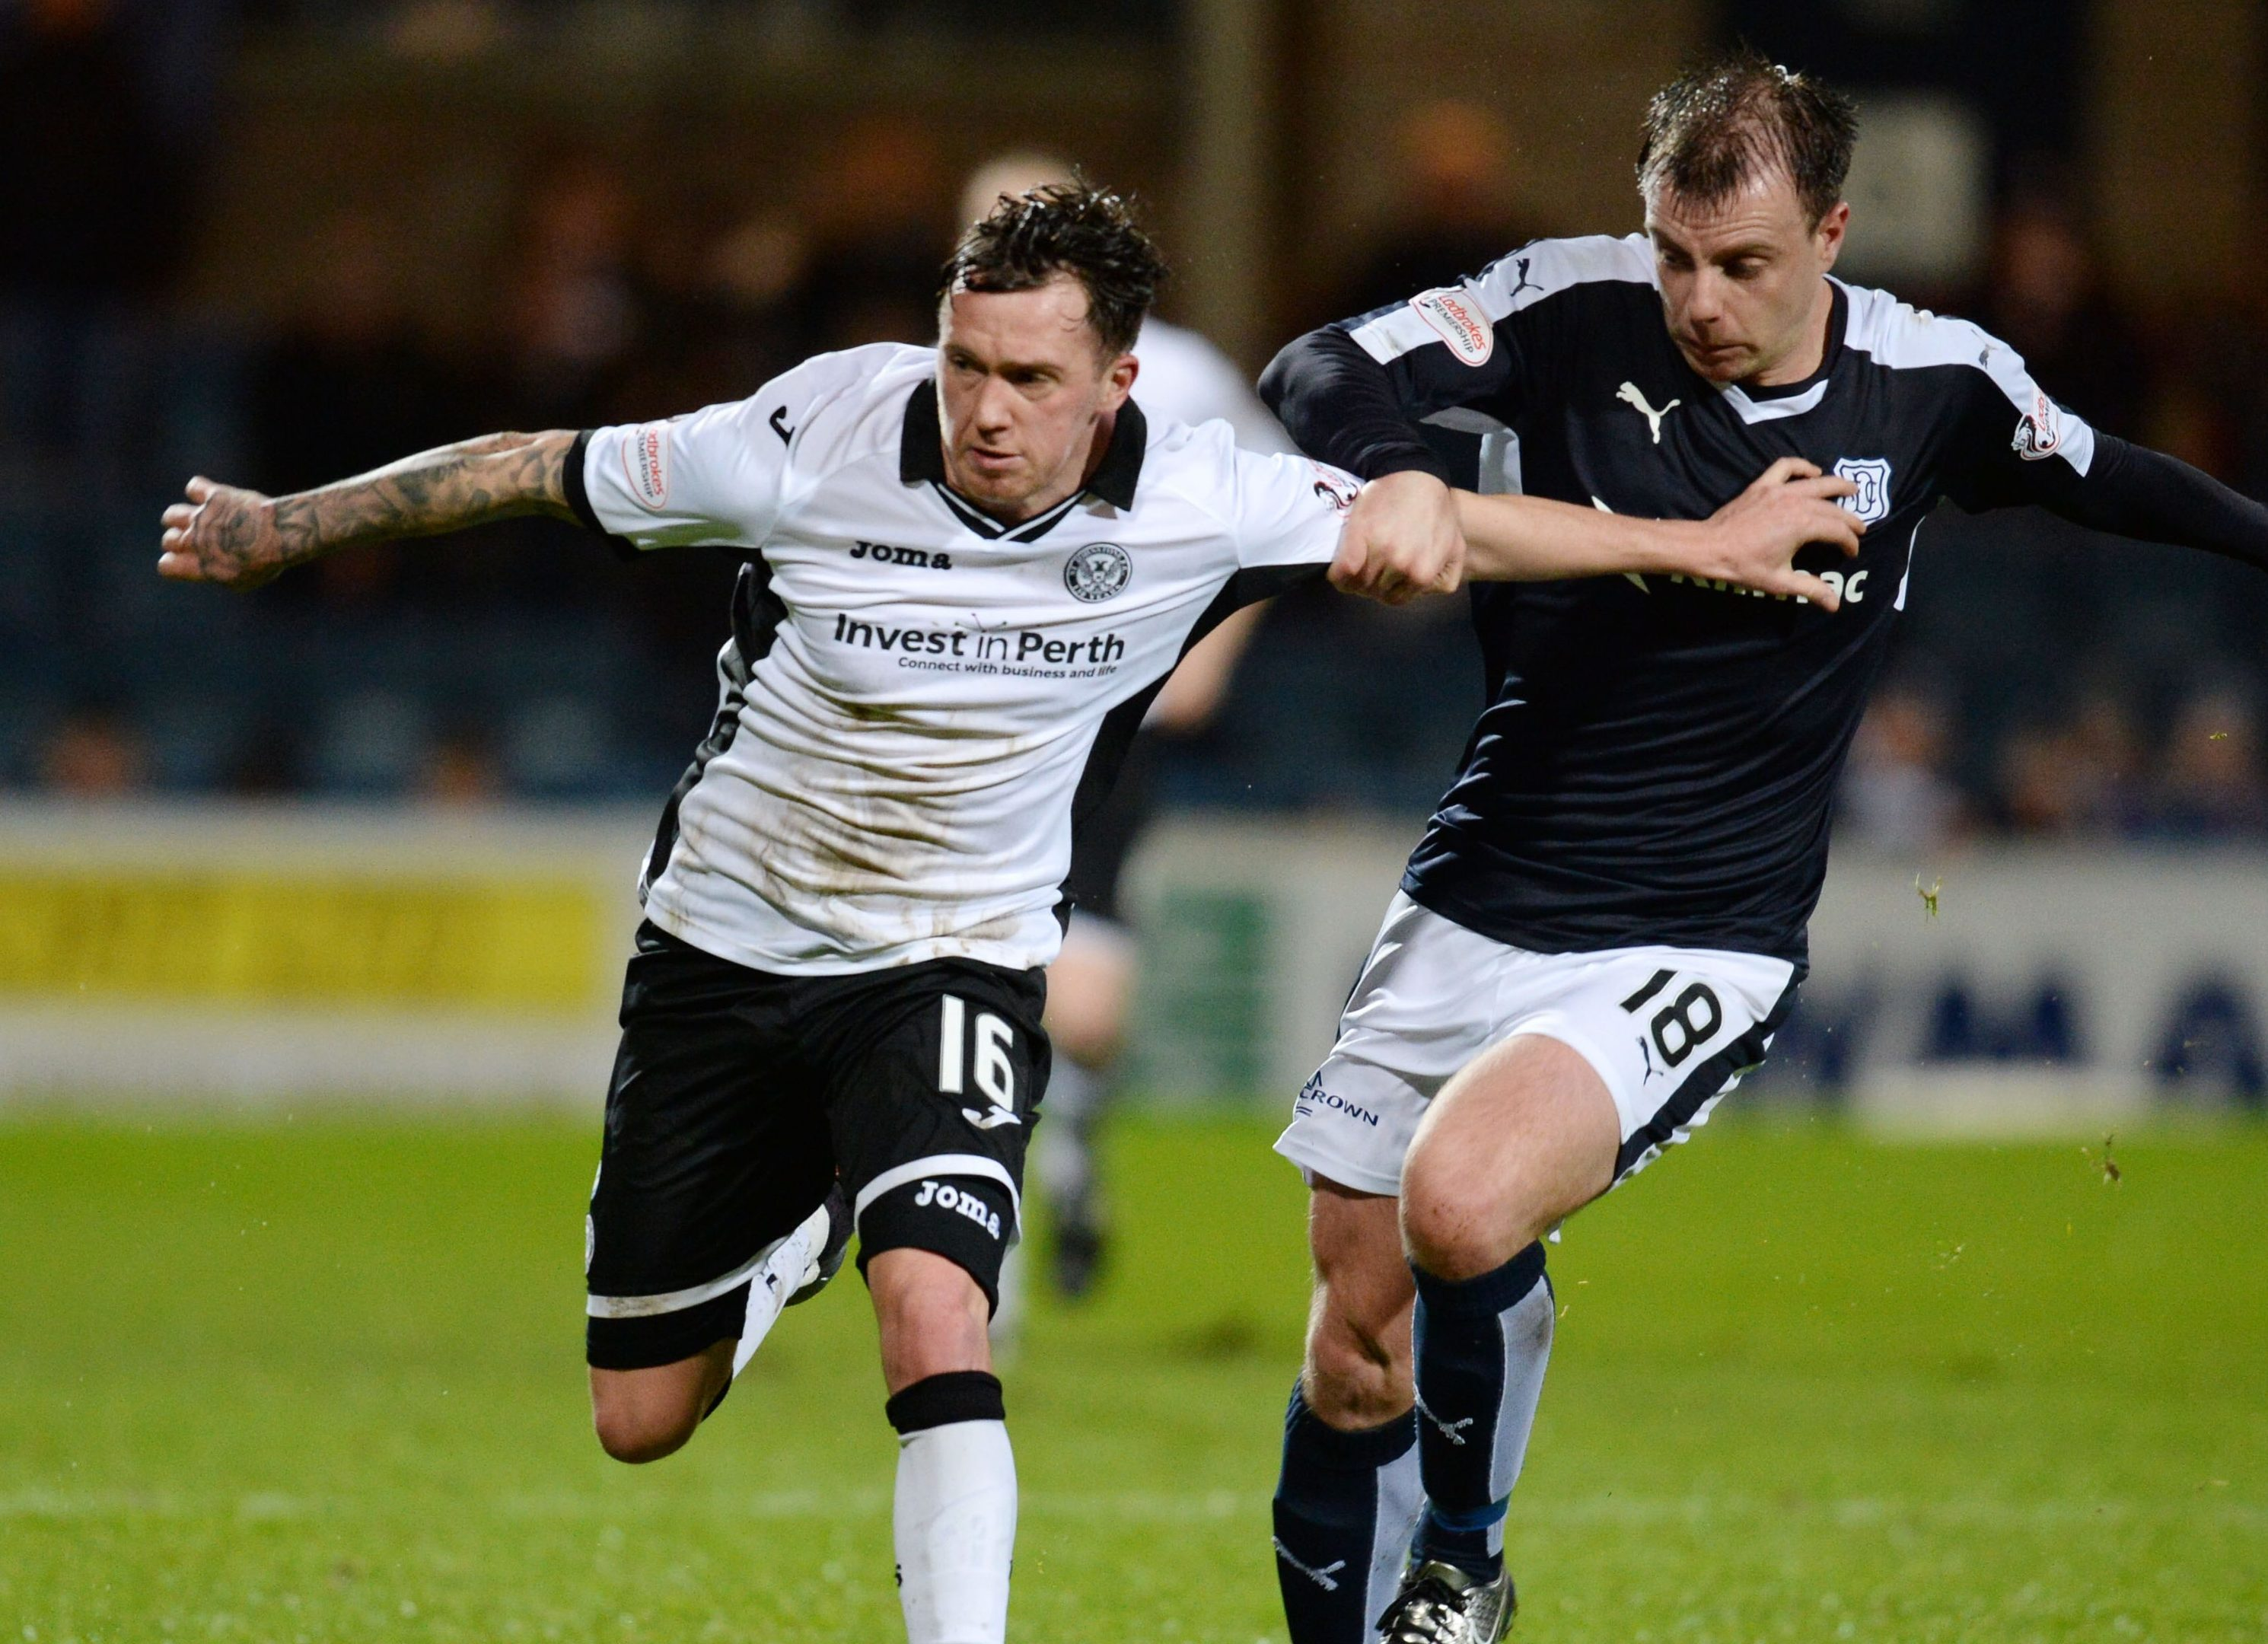 St Johnstone's Danny Swanson battles for the ball against Dundee's Paul McGowan last season.